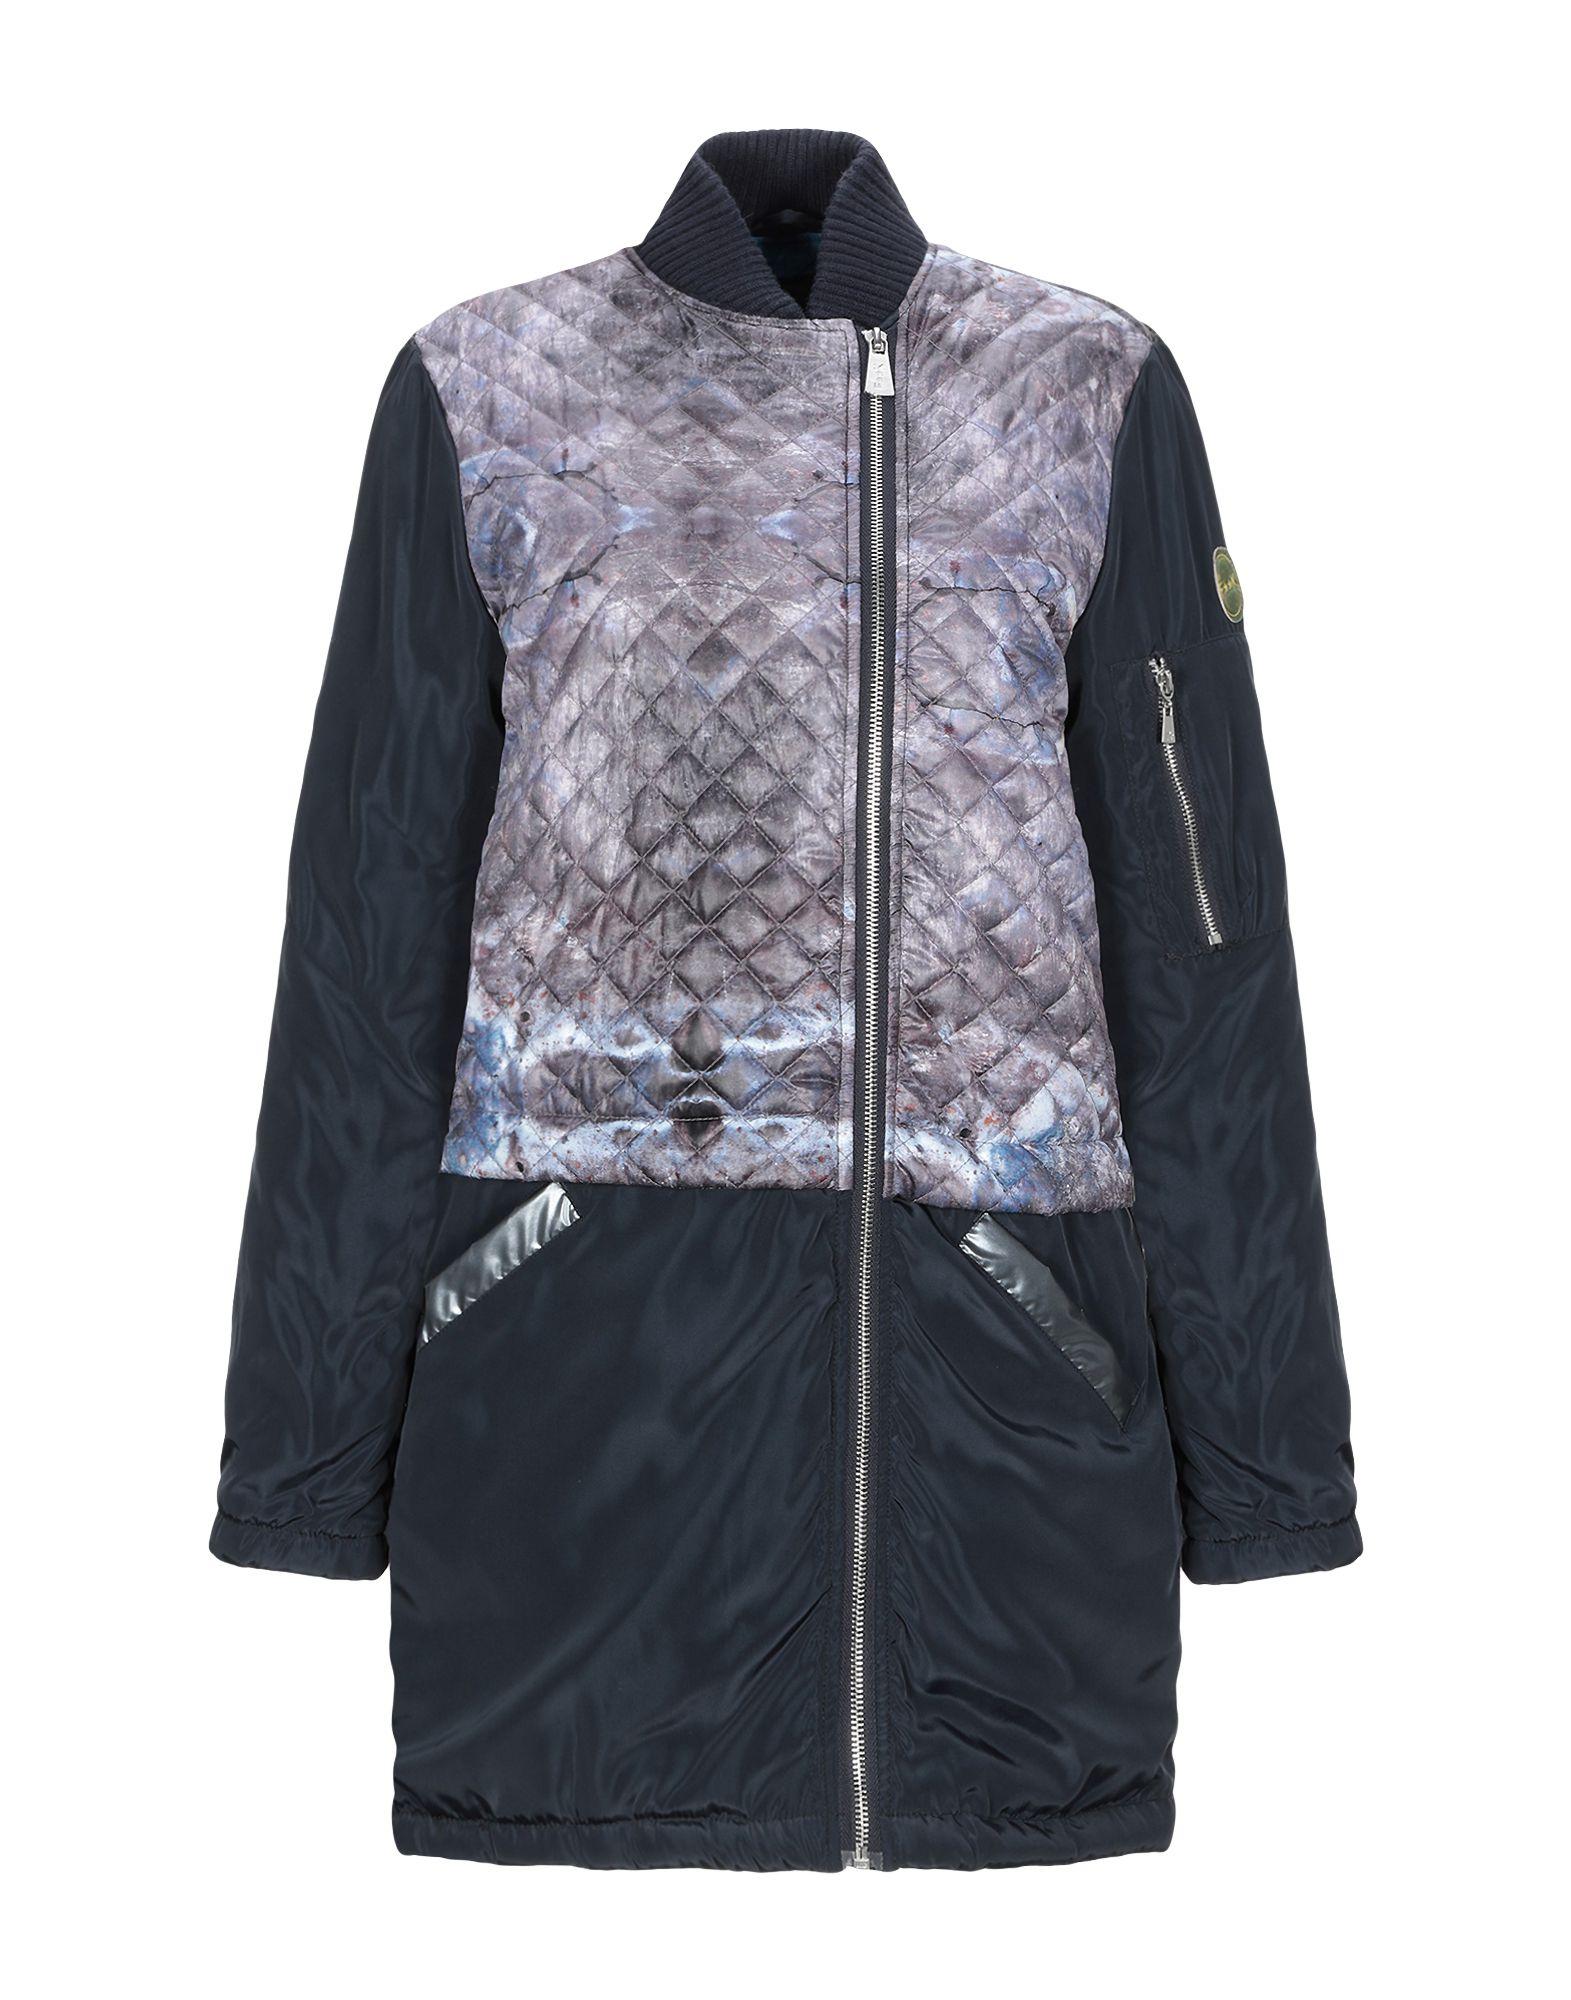 Фото - F**K PROJECT Куртка project [foce] singleseason куртка